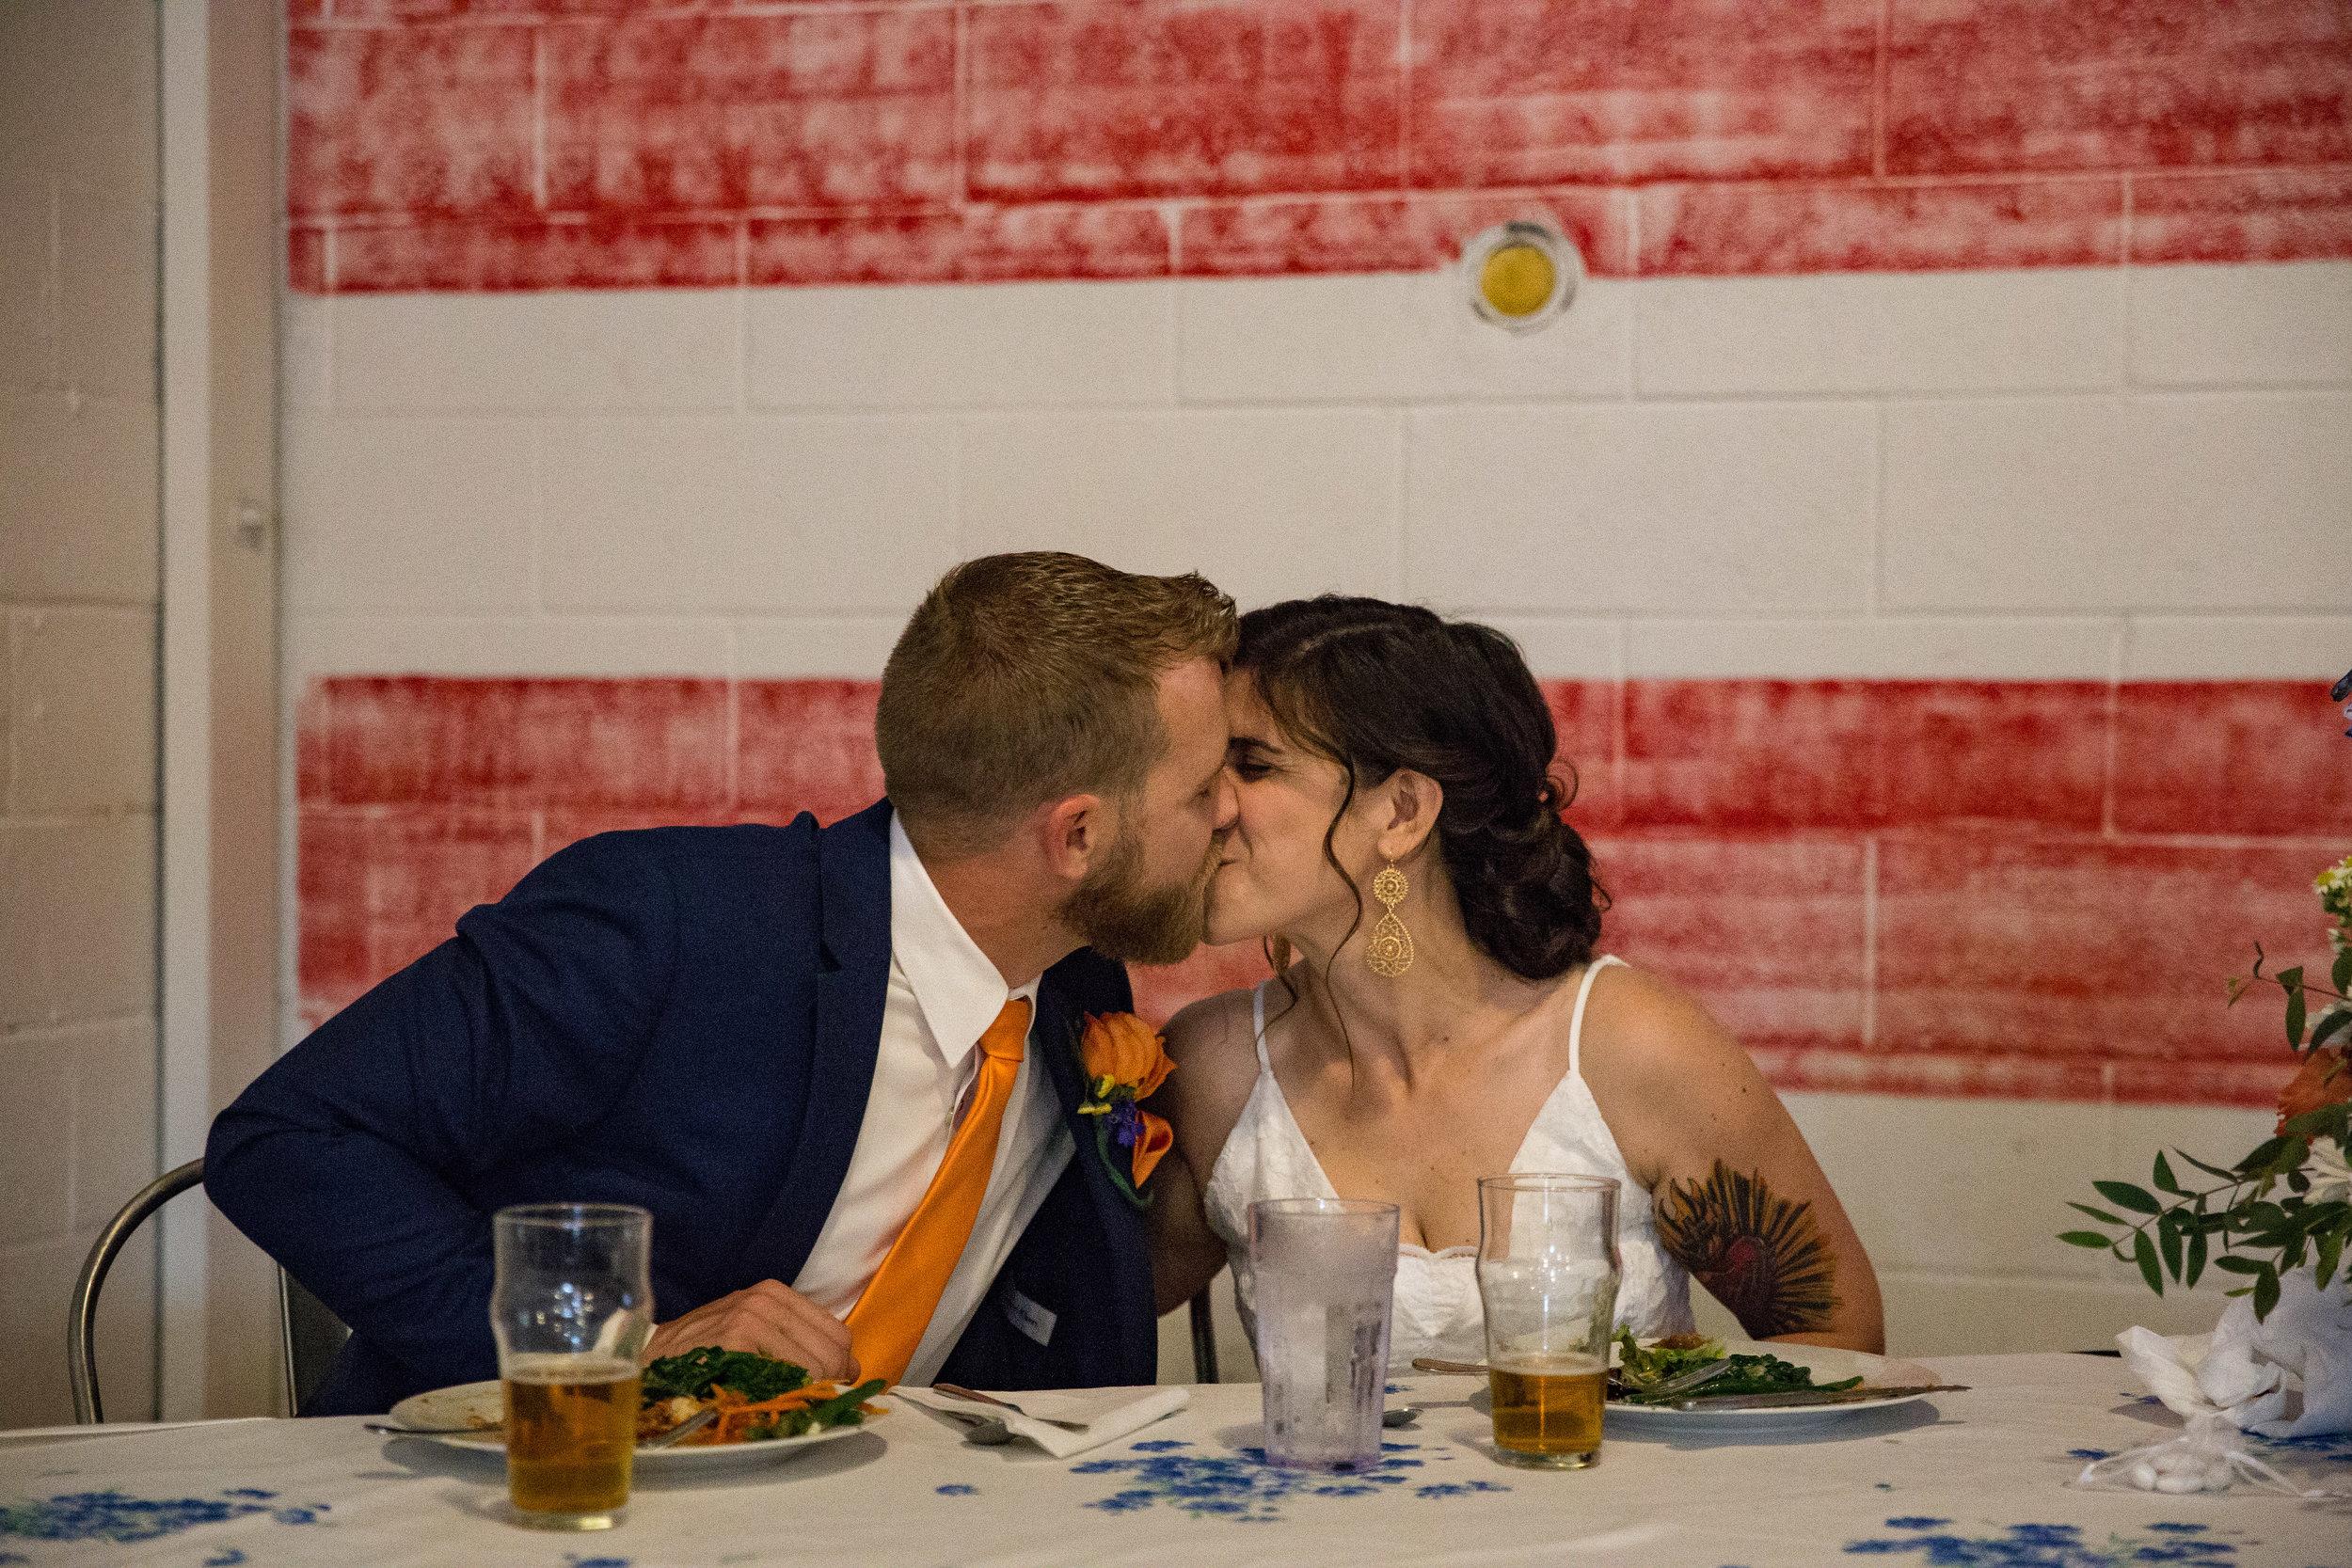 Natalie and Dallas Mooney Wedding 6-8-19_Tania Watt Photography-499.jpg